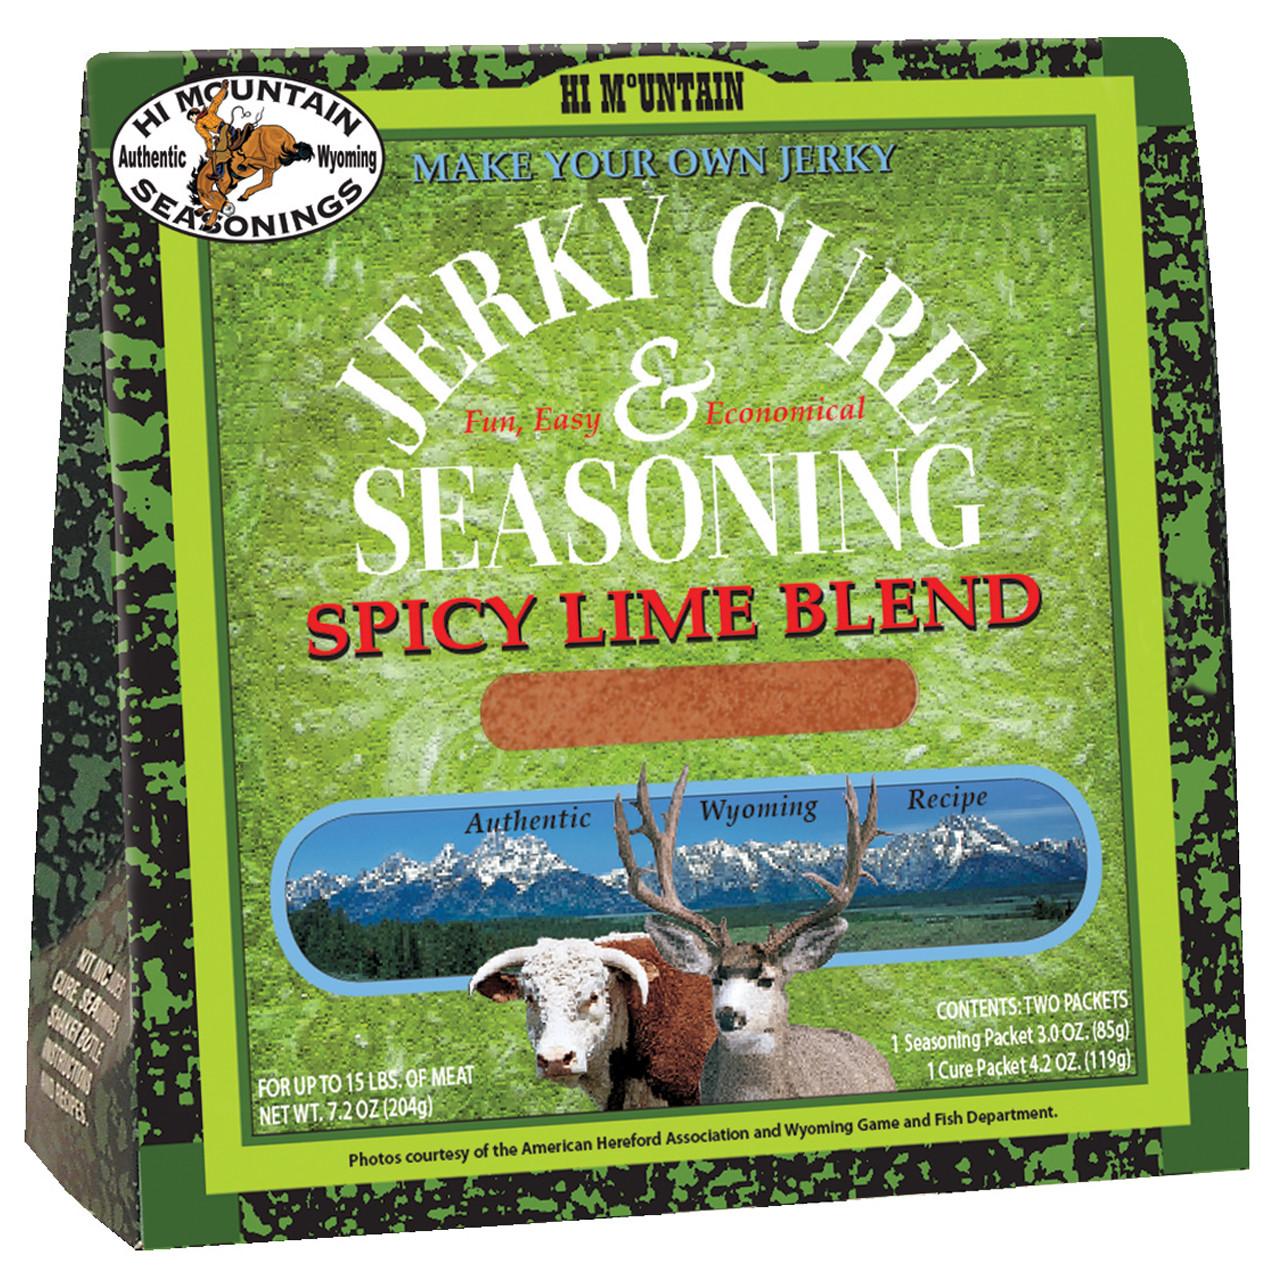 Spicy Lime Blend Jerky Kit